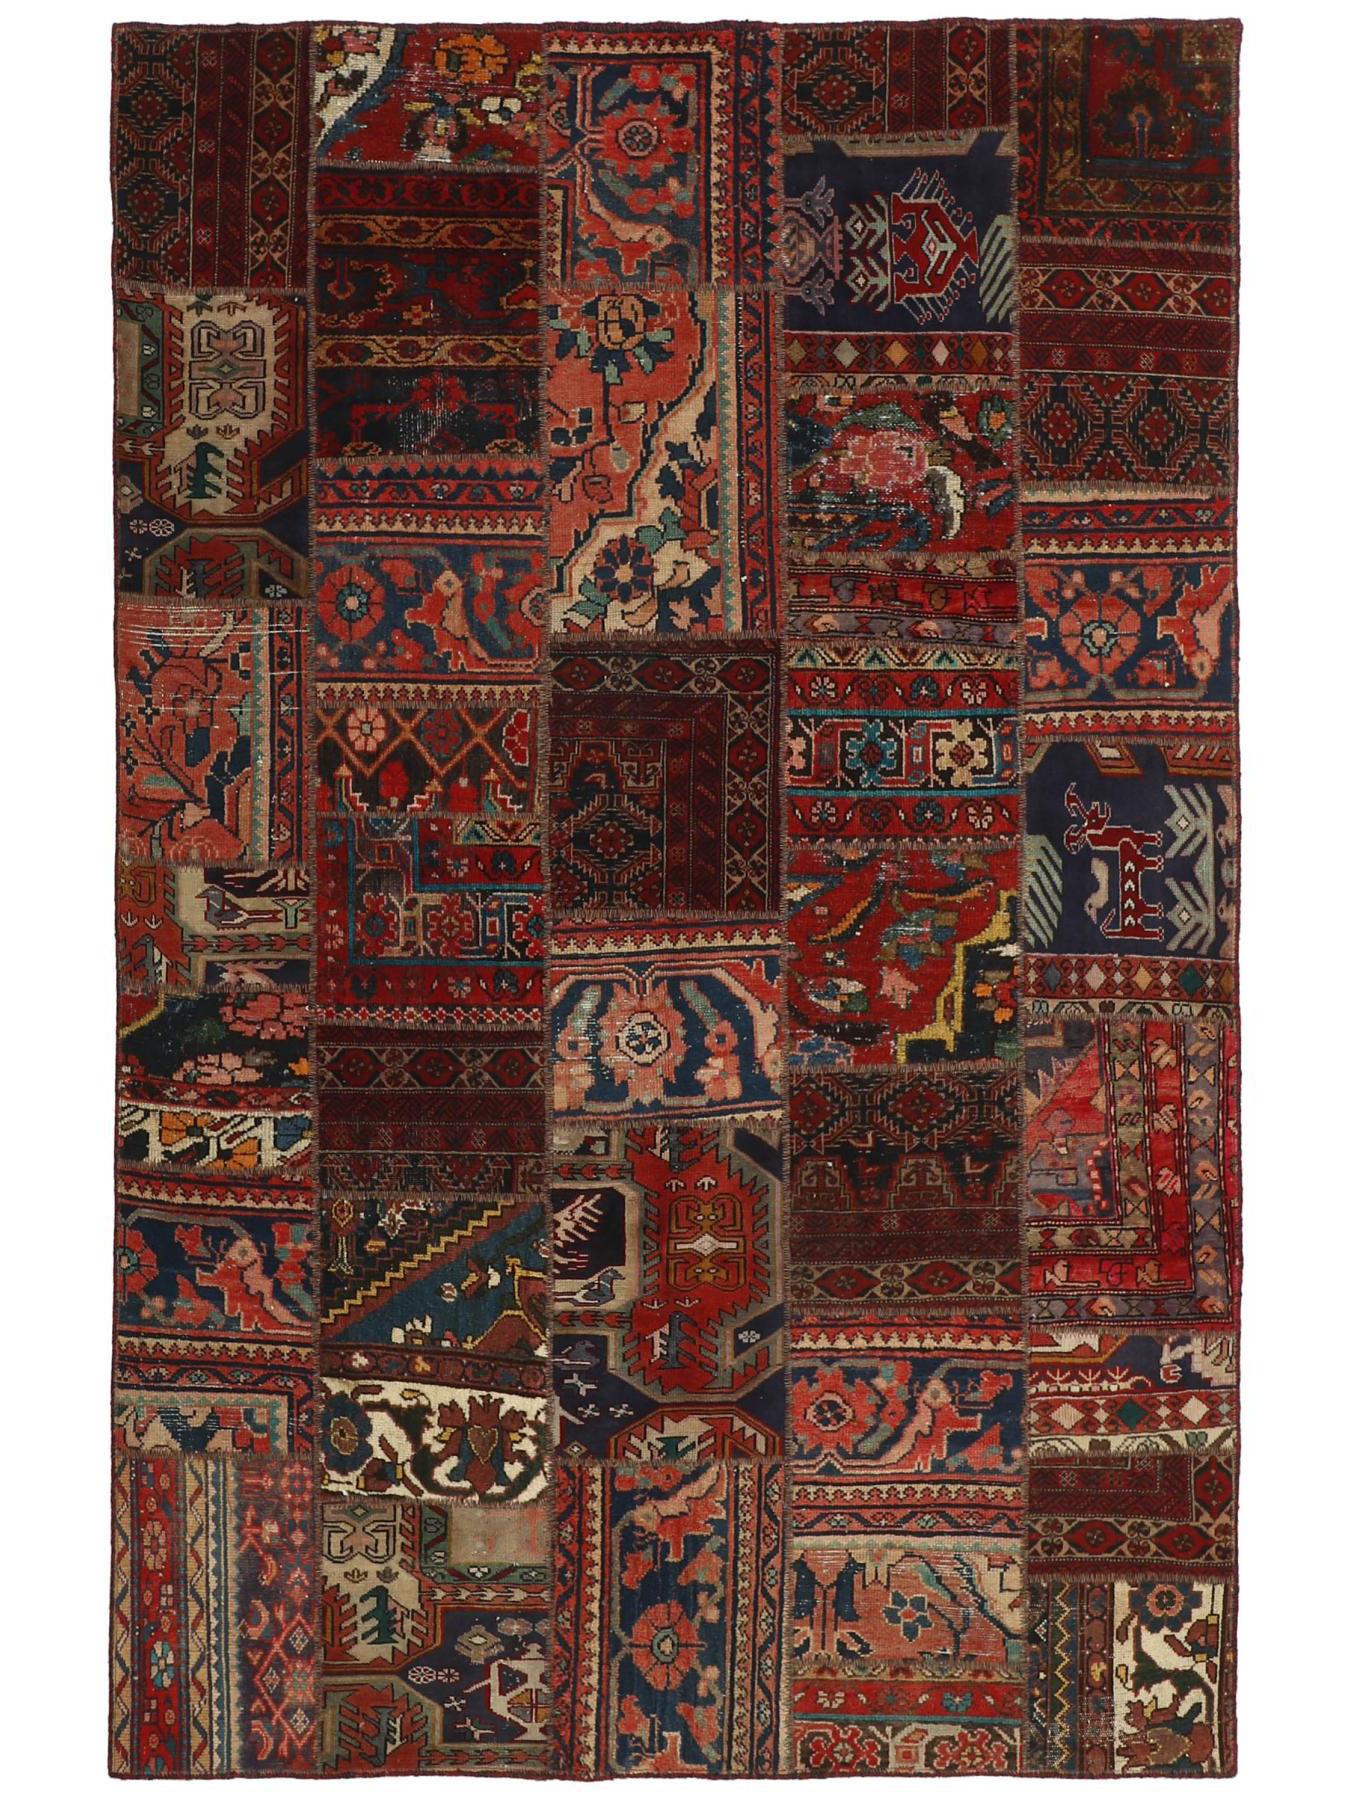 Tapis persans - Vintage Persian Royal Patchwork Malayer